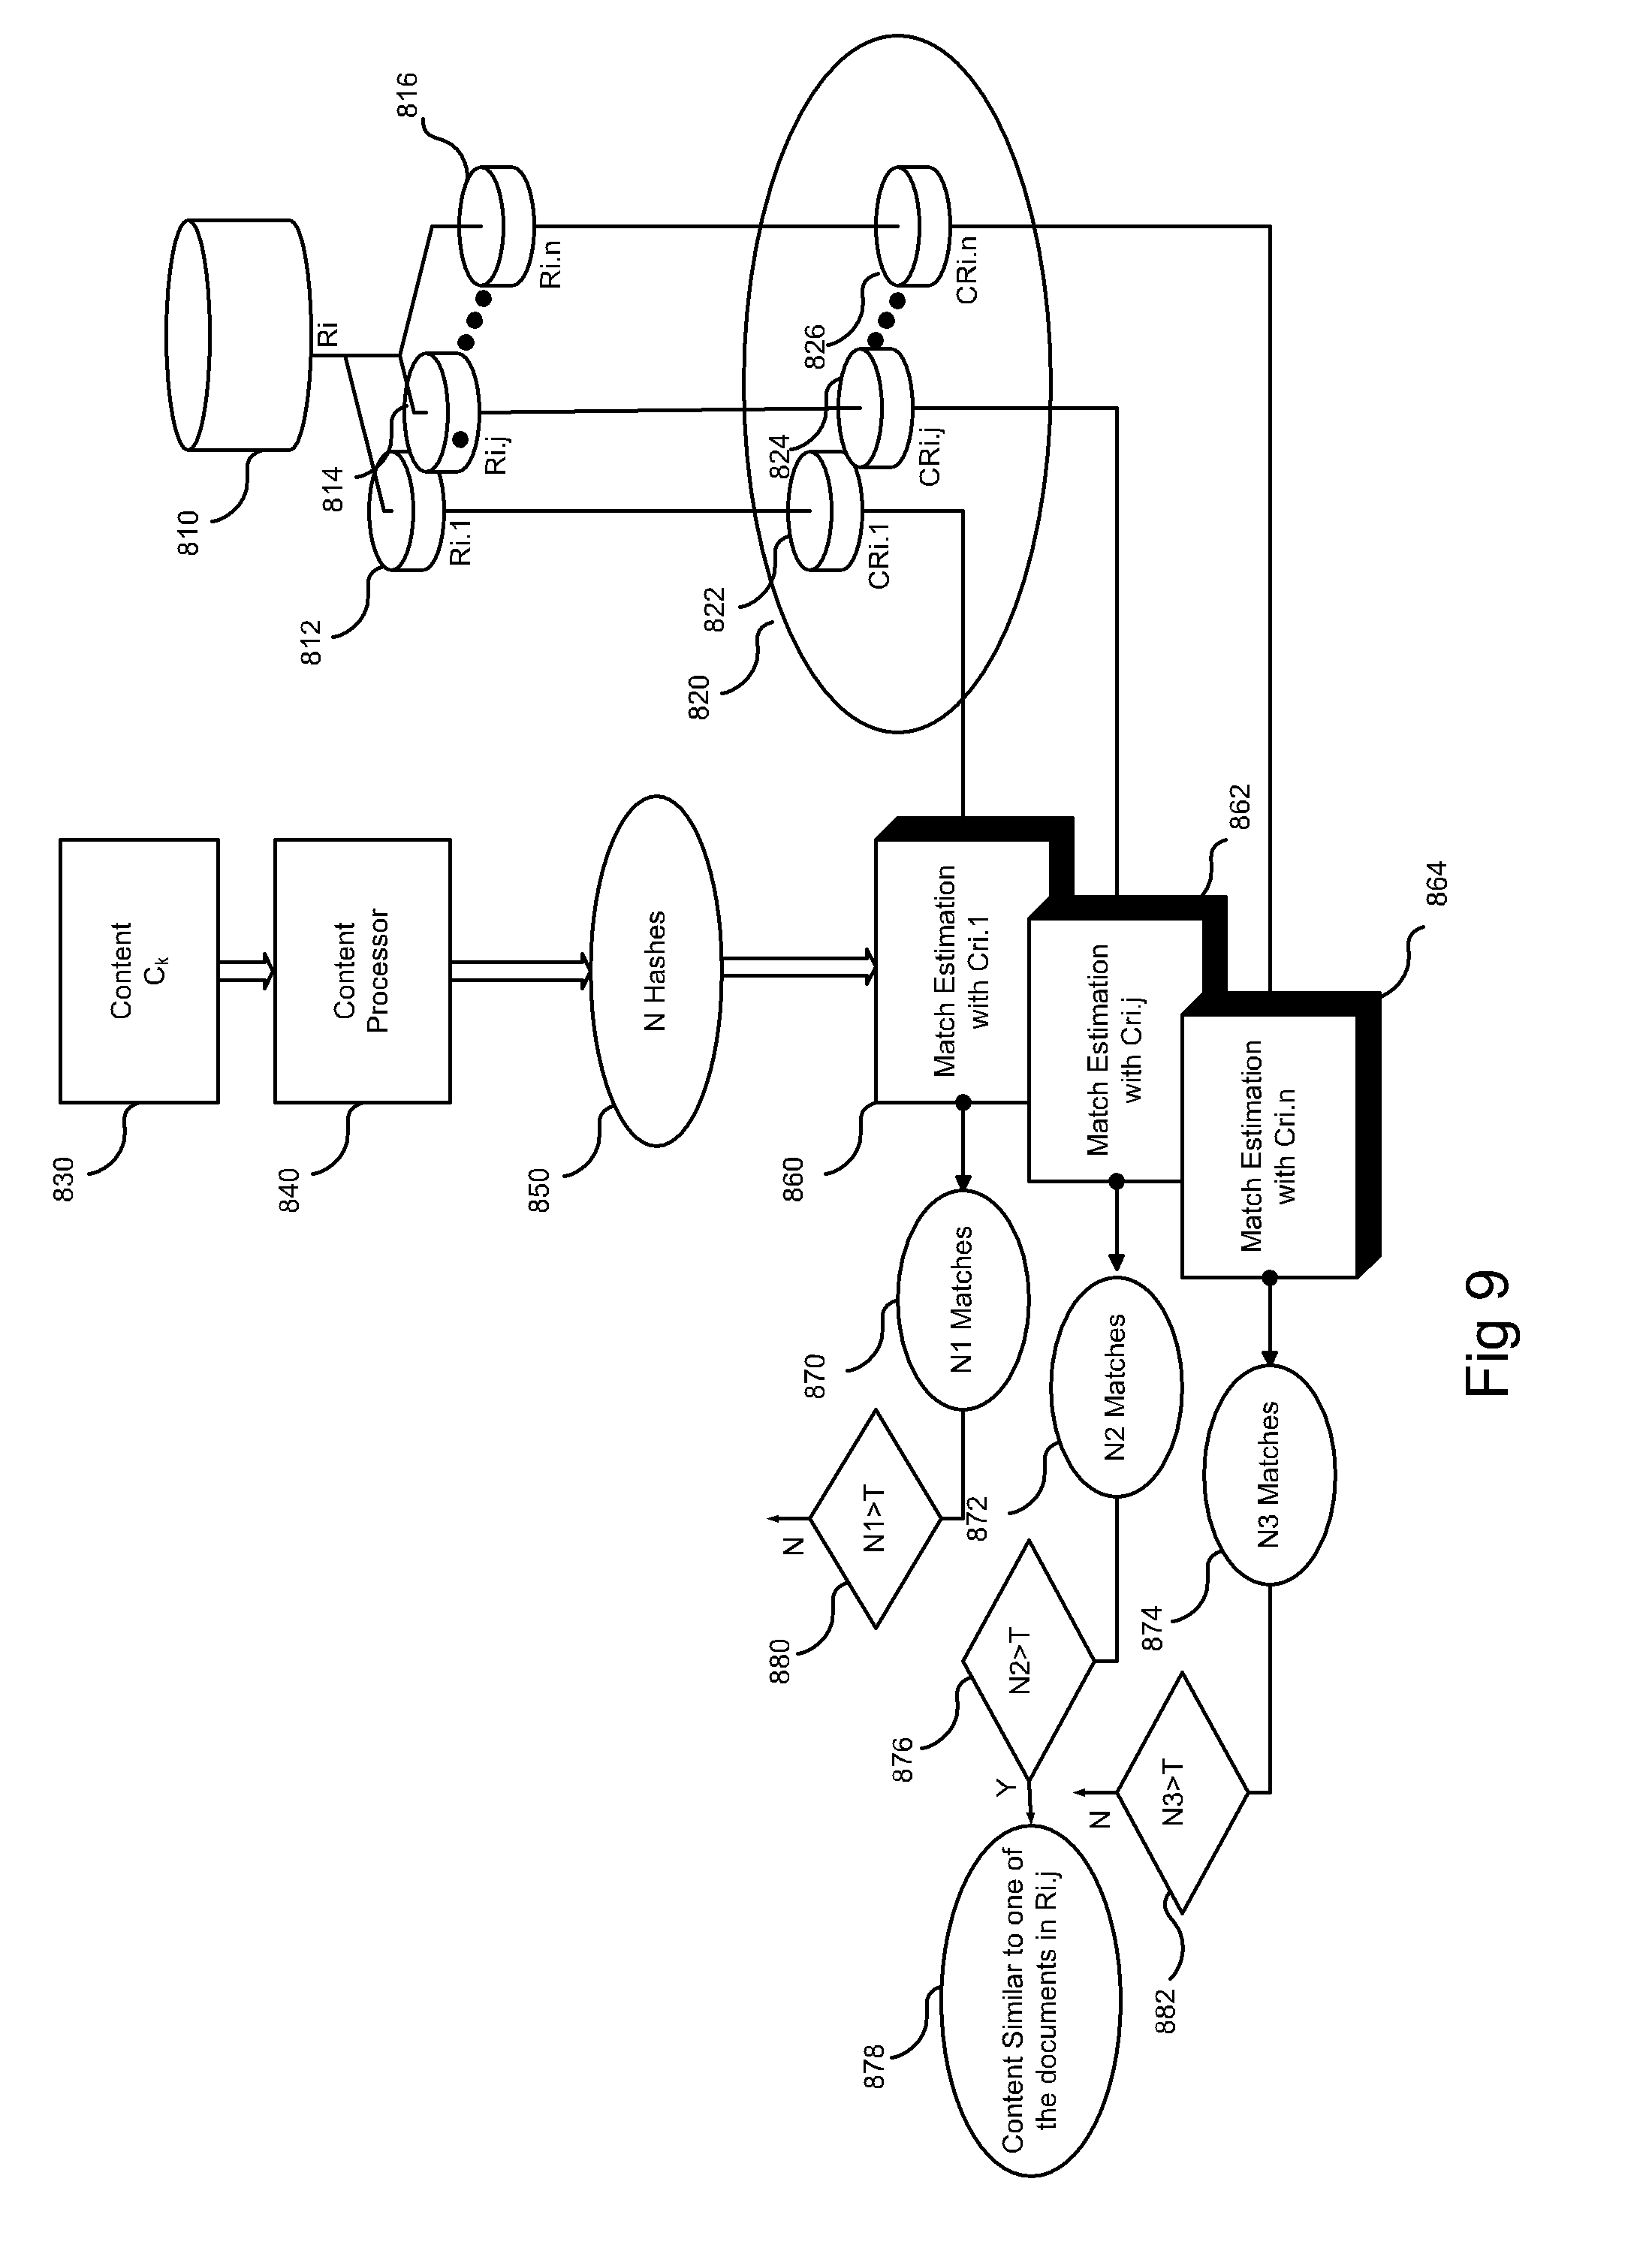 Patent US 9,692,762 B2